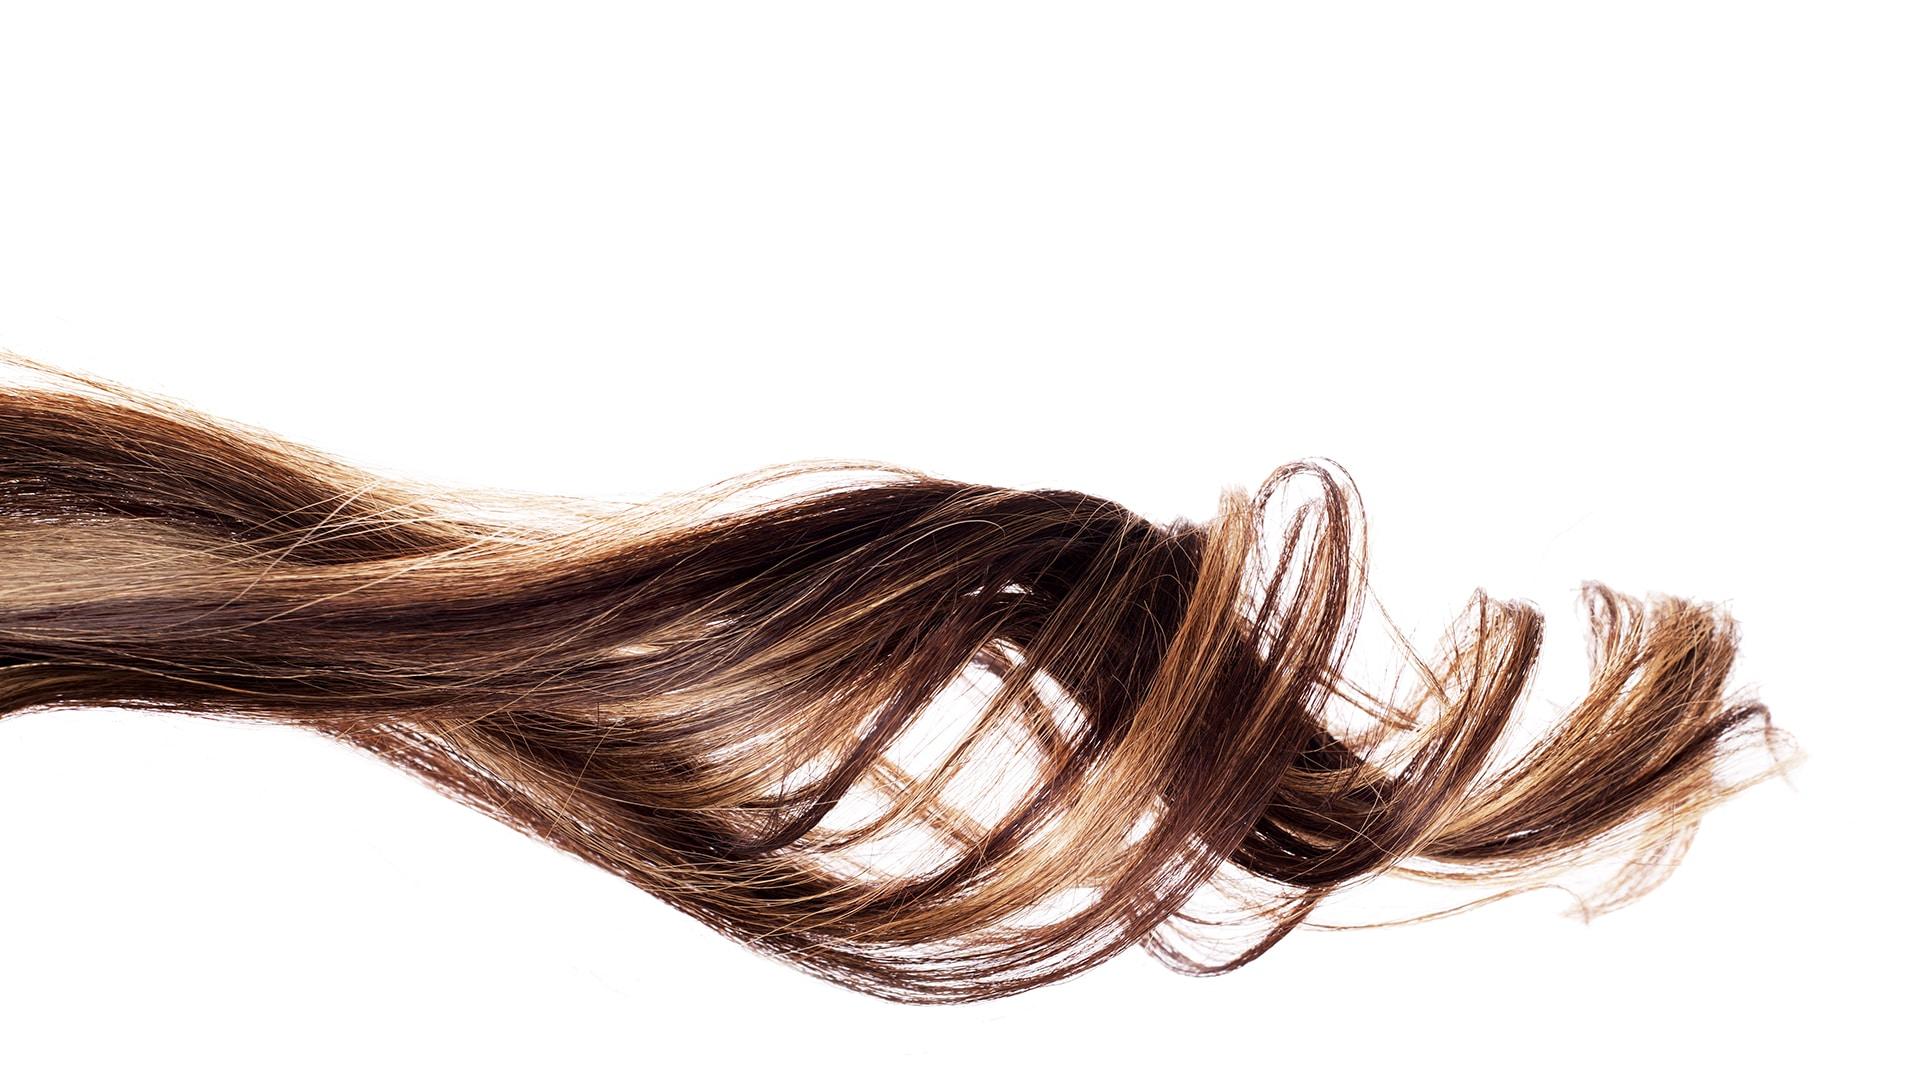 Strands of hair.